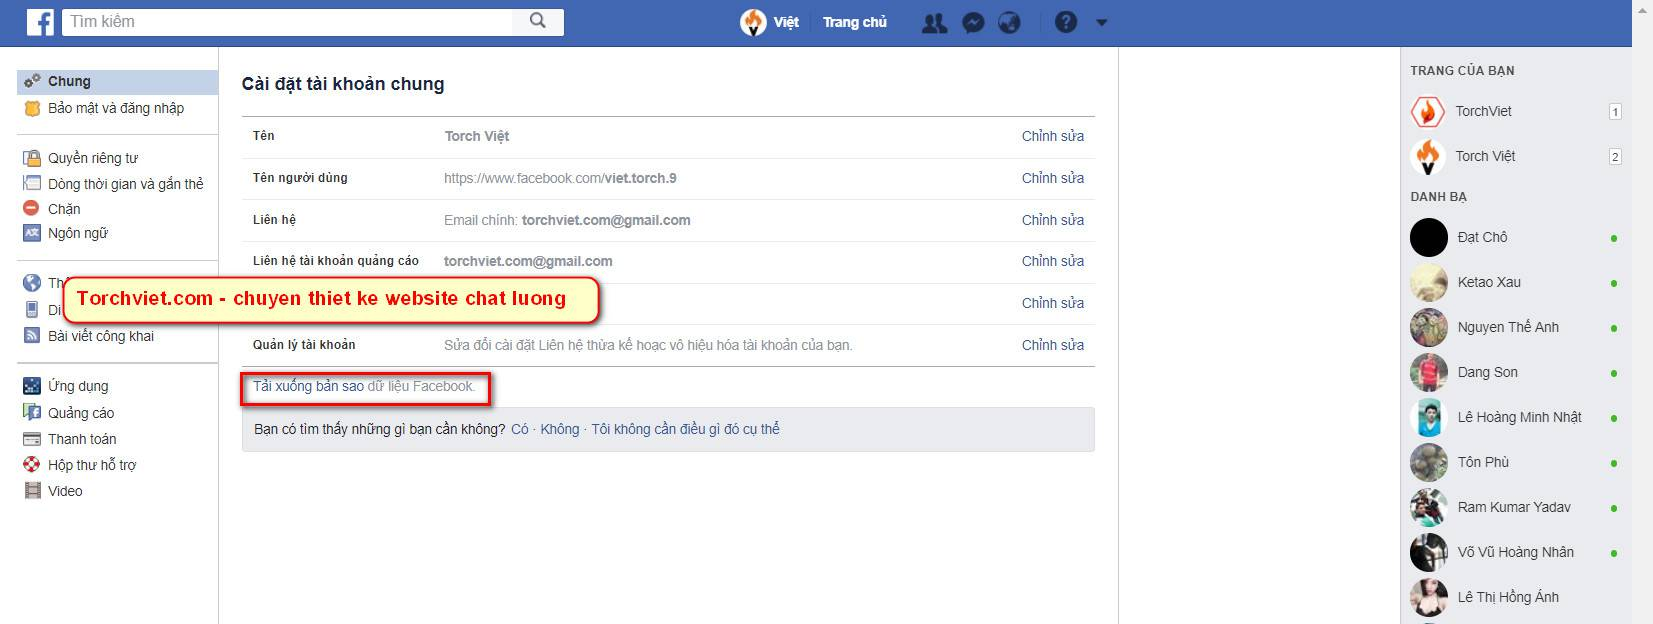 sao-luu-tao-fangape-facebook-tu-tai-khoan-ca-nhan